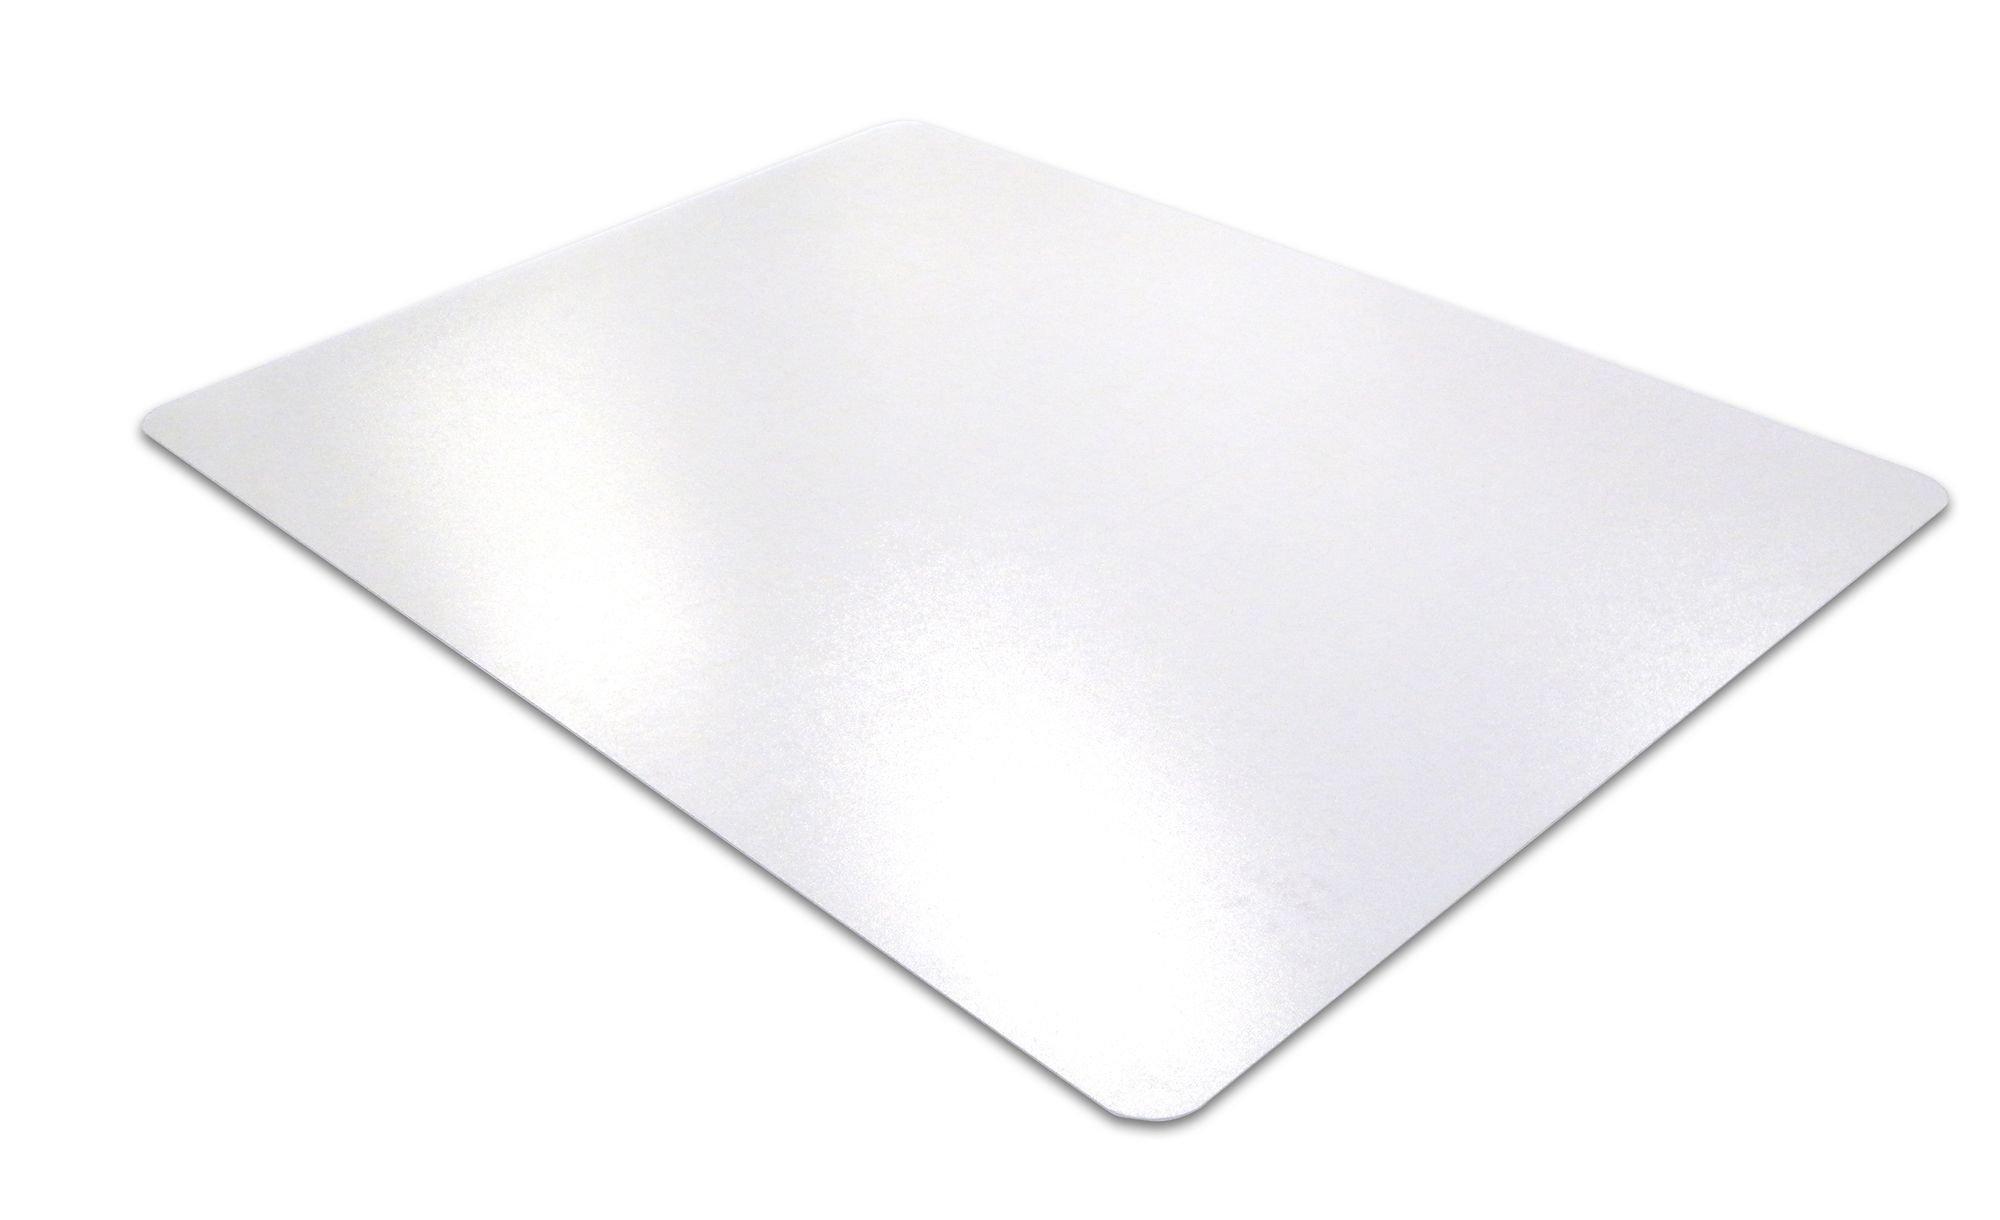 Desktex PVC Smooth Back Desk Mat, 20'' x 36'', Rectangular, Clear (FBDE2036V)